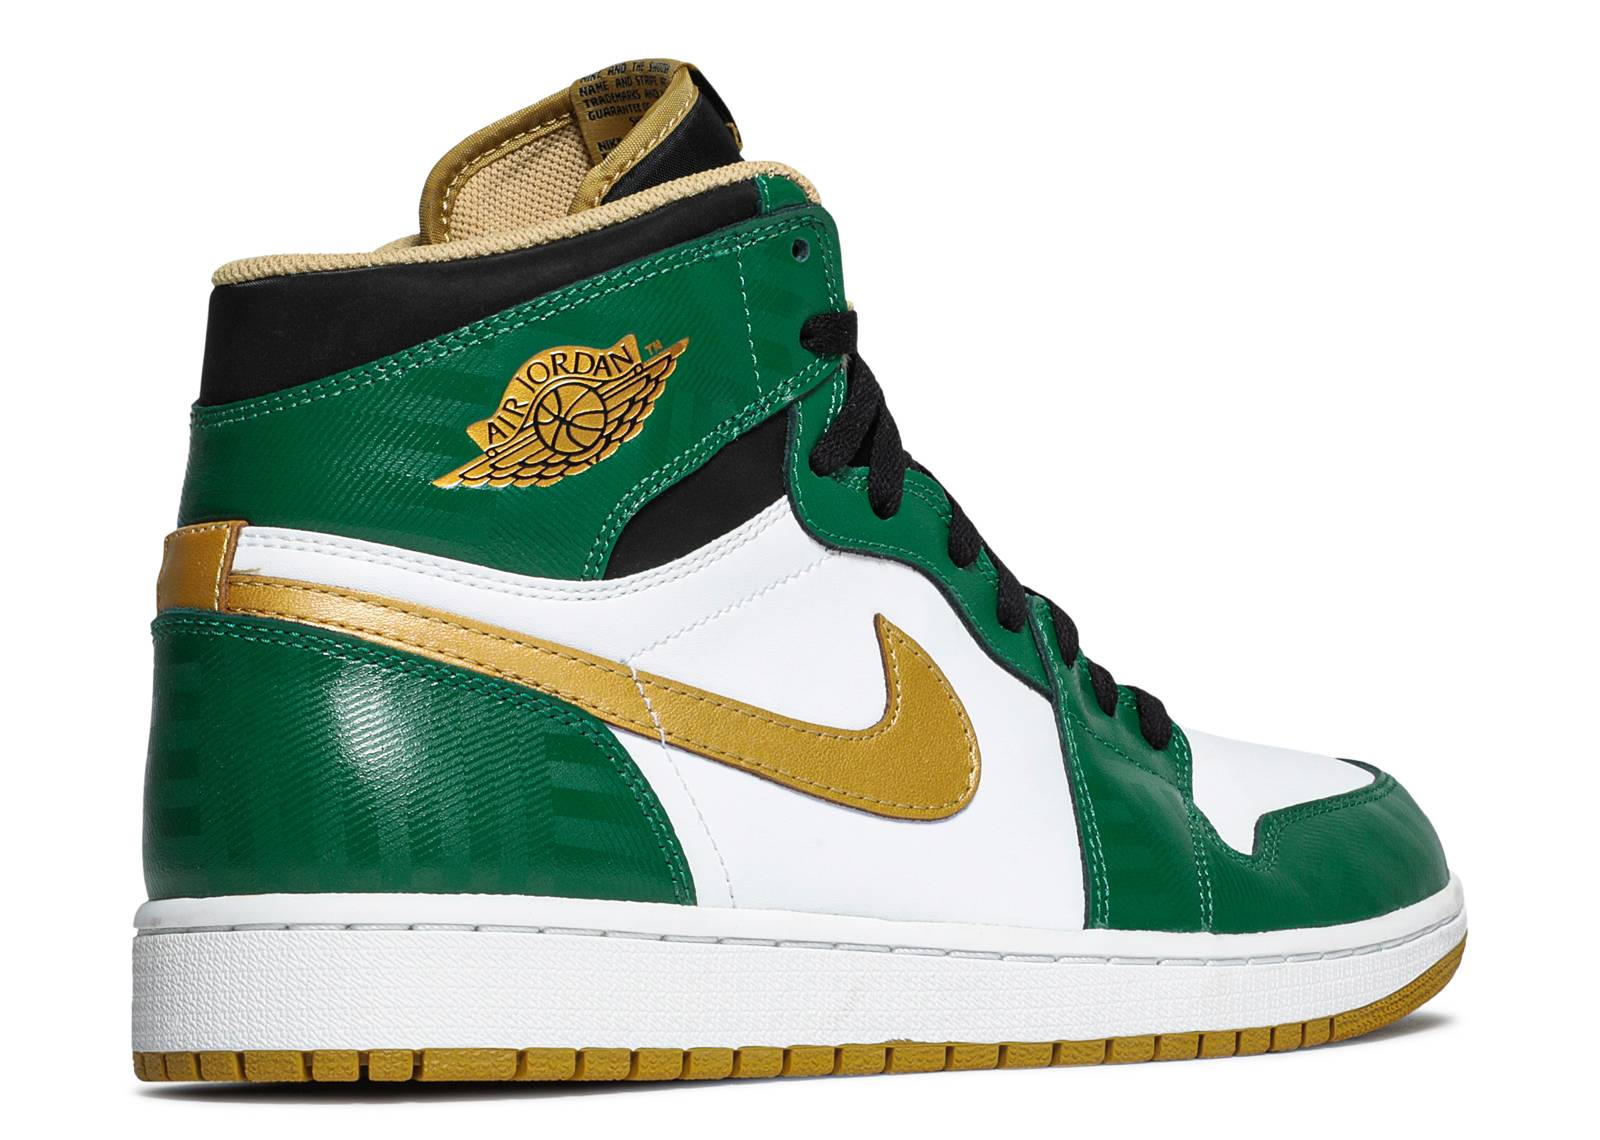 finest selection f04f5 e0f62 Nike Store ... mint green gold  air jordan retro 1 green gold air jordan  retro ...